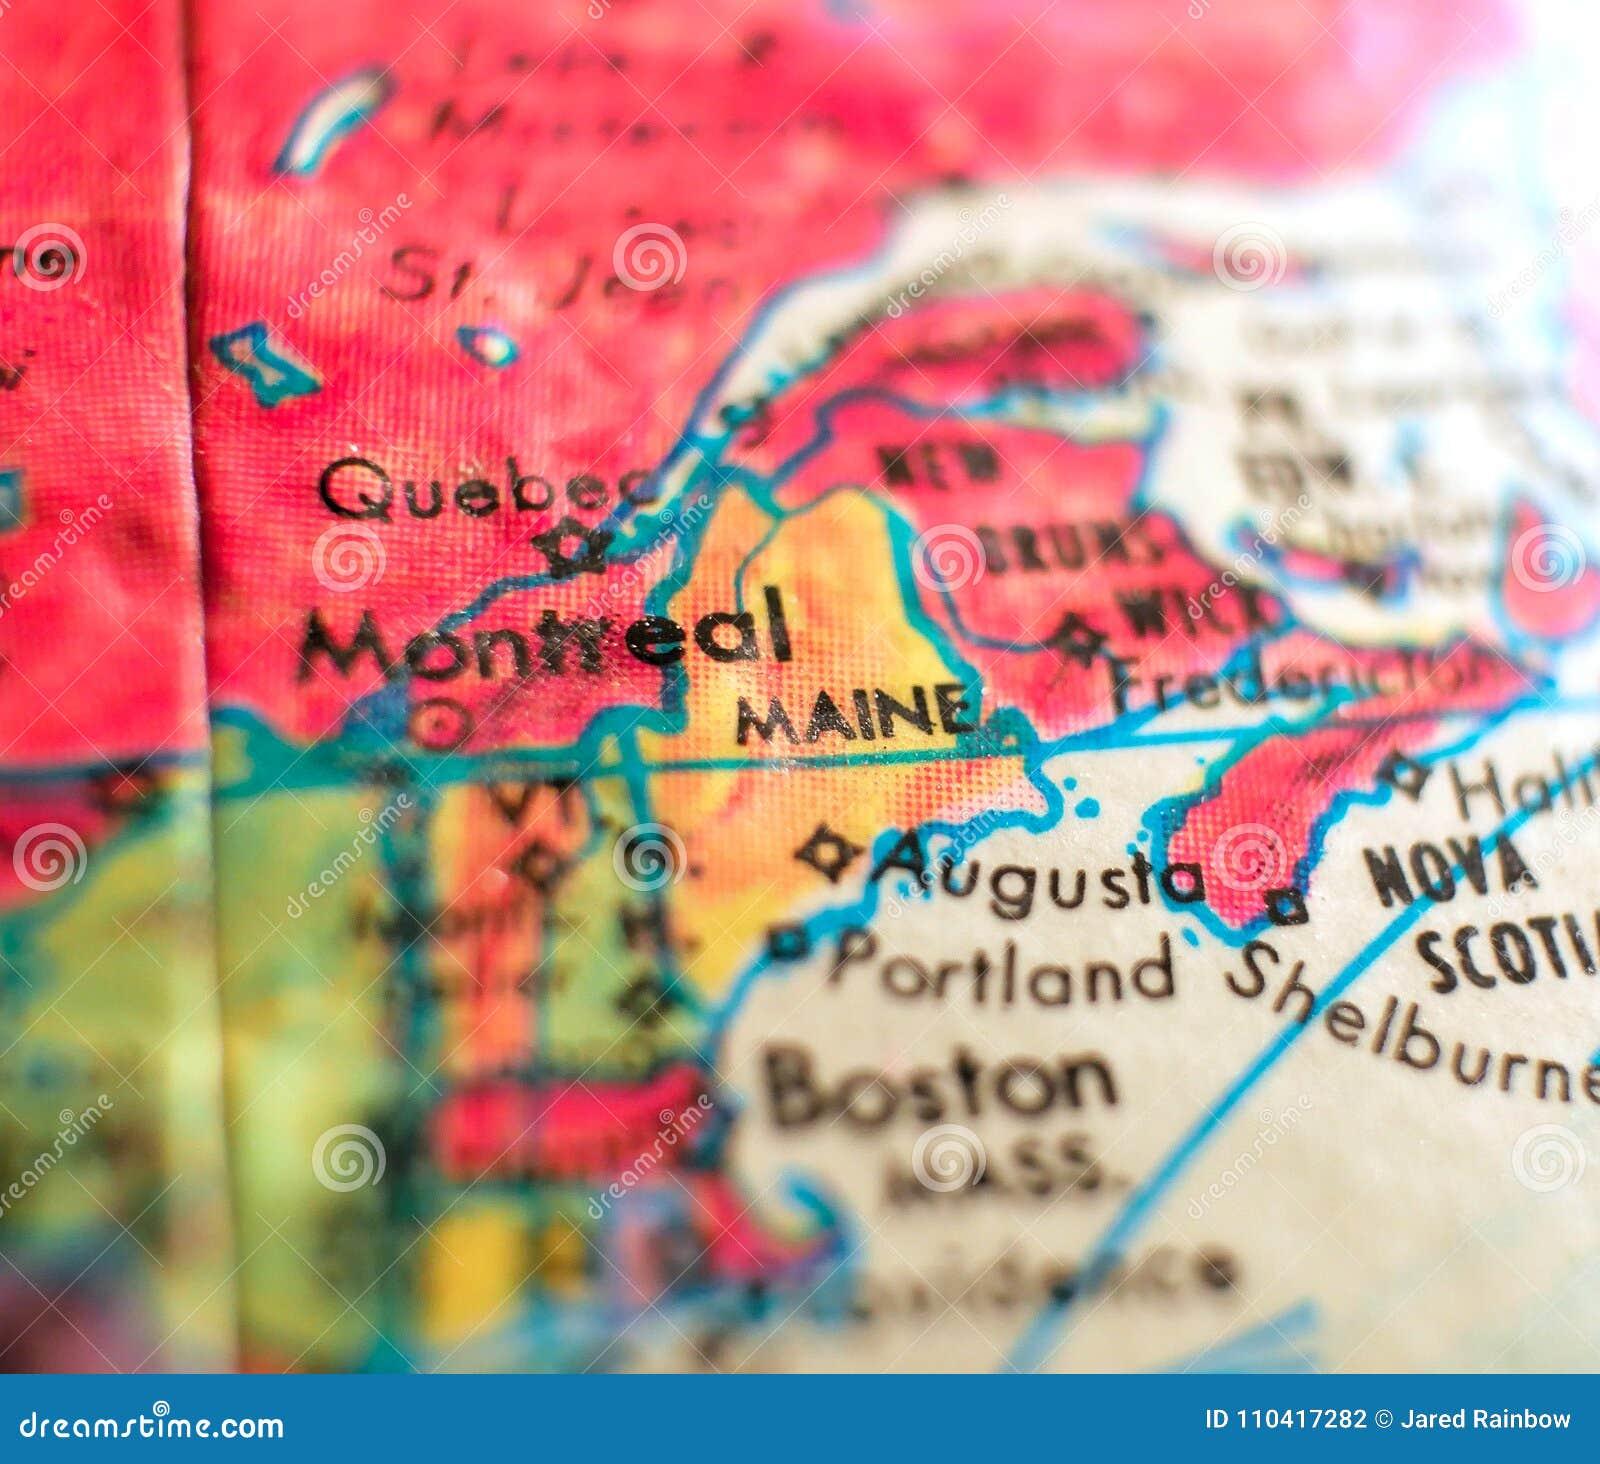 State Of Maine Map USA Focus Macro Shot On Globe For Travel ... on map of maine coast, map nashville usa, visit maine usa, map san antonio usa, map arkansas usa, map of maine rivers, map of maine towns, map cuba usa, map maine cities, map north dakota usa, new jersey, map houston usa, map ireland usa, map panama usa, new hampshire, map charlotte usa, map baltimore usa, map new hampshire usa, north carolina, map state usa, new york, rhode island, new england, map minneapolis usa, map russia usa, map virgin islands usa,